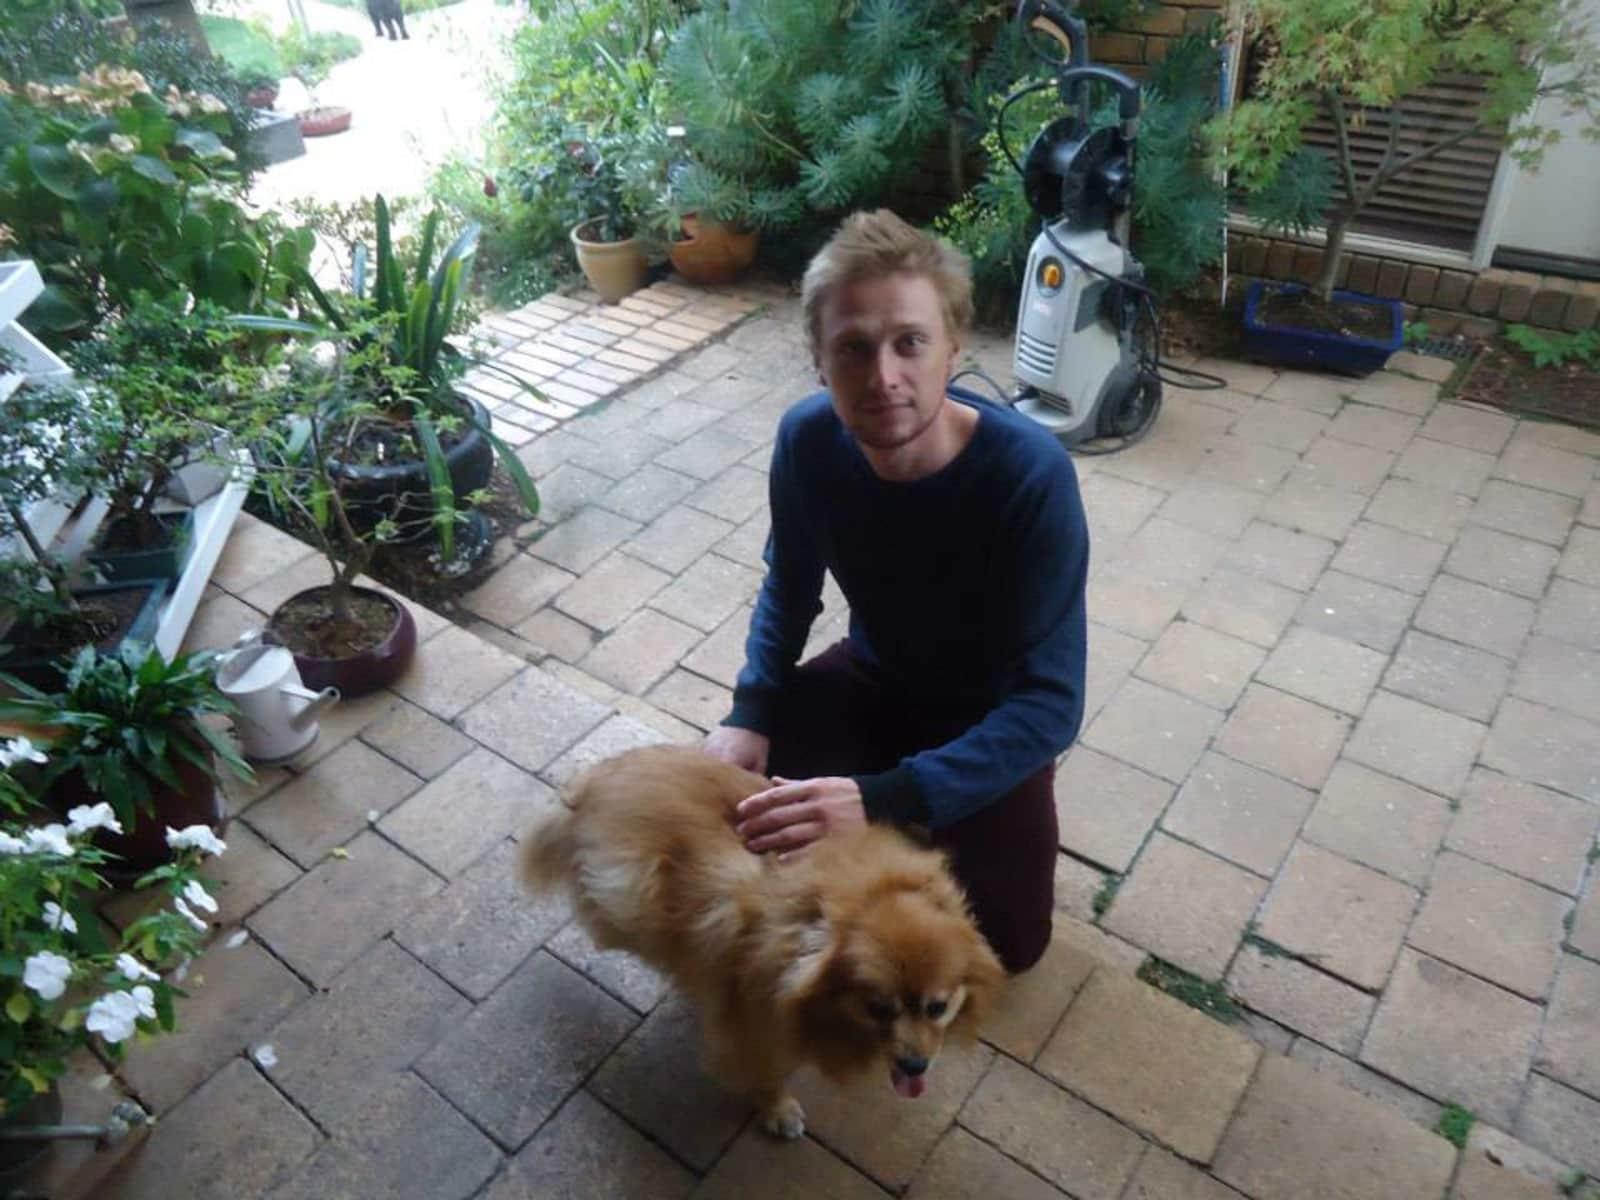 Ryan from Templestowe Lower, Victoria, Australia